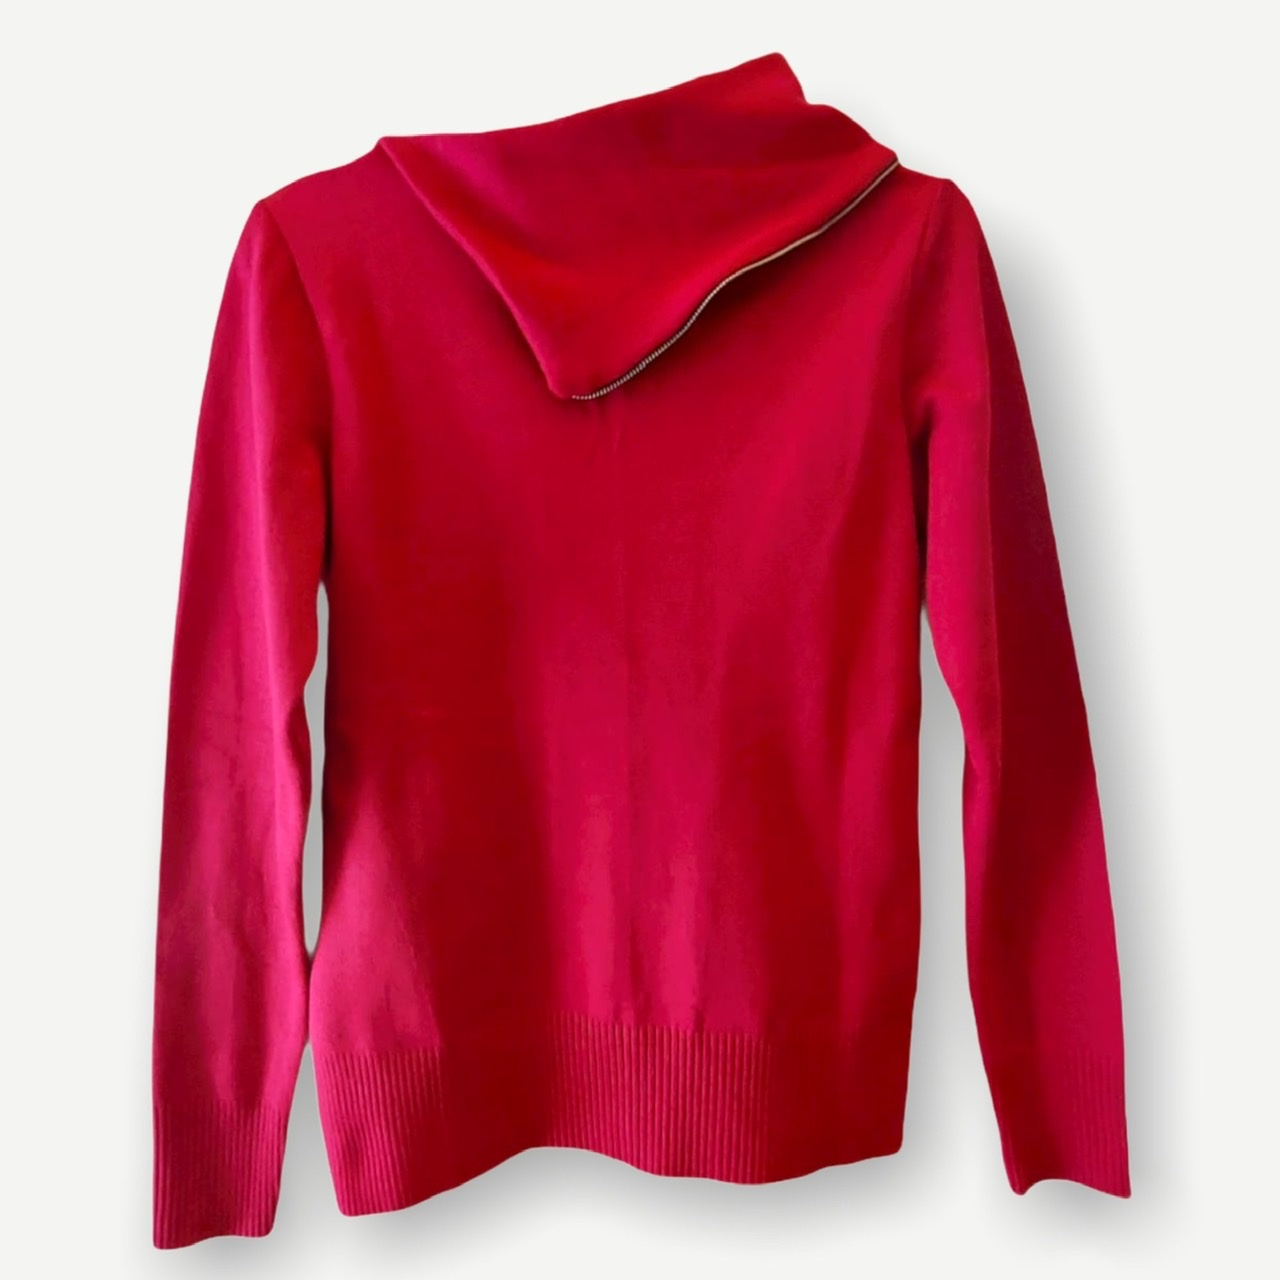 Blusa Fernanda pink tricot  - Vivian Bógus